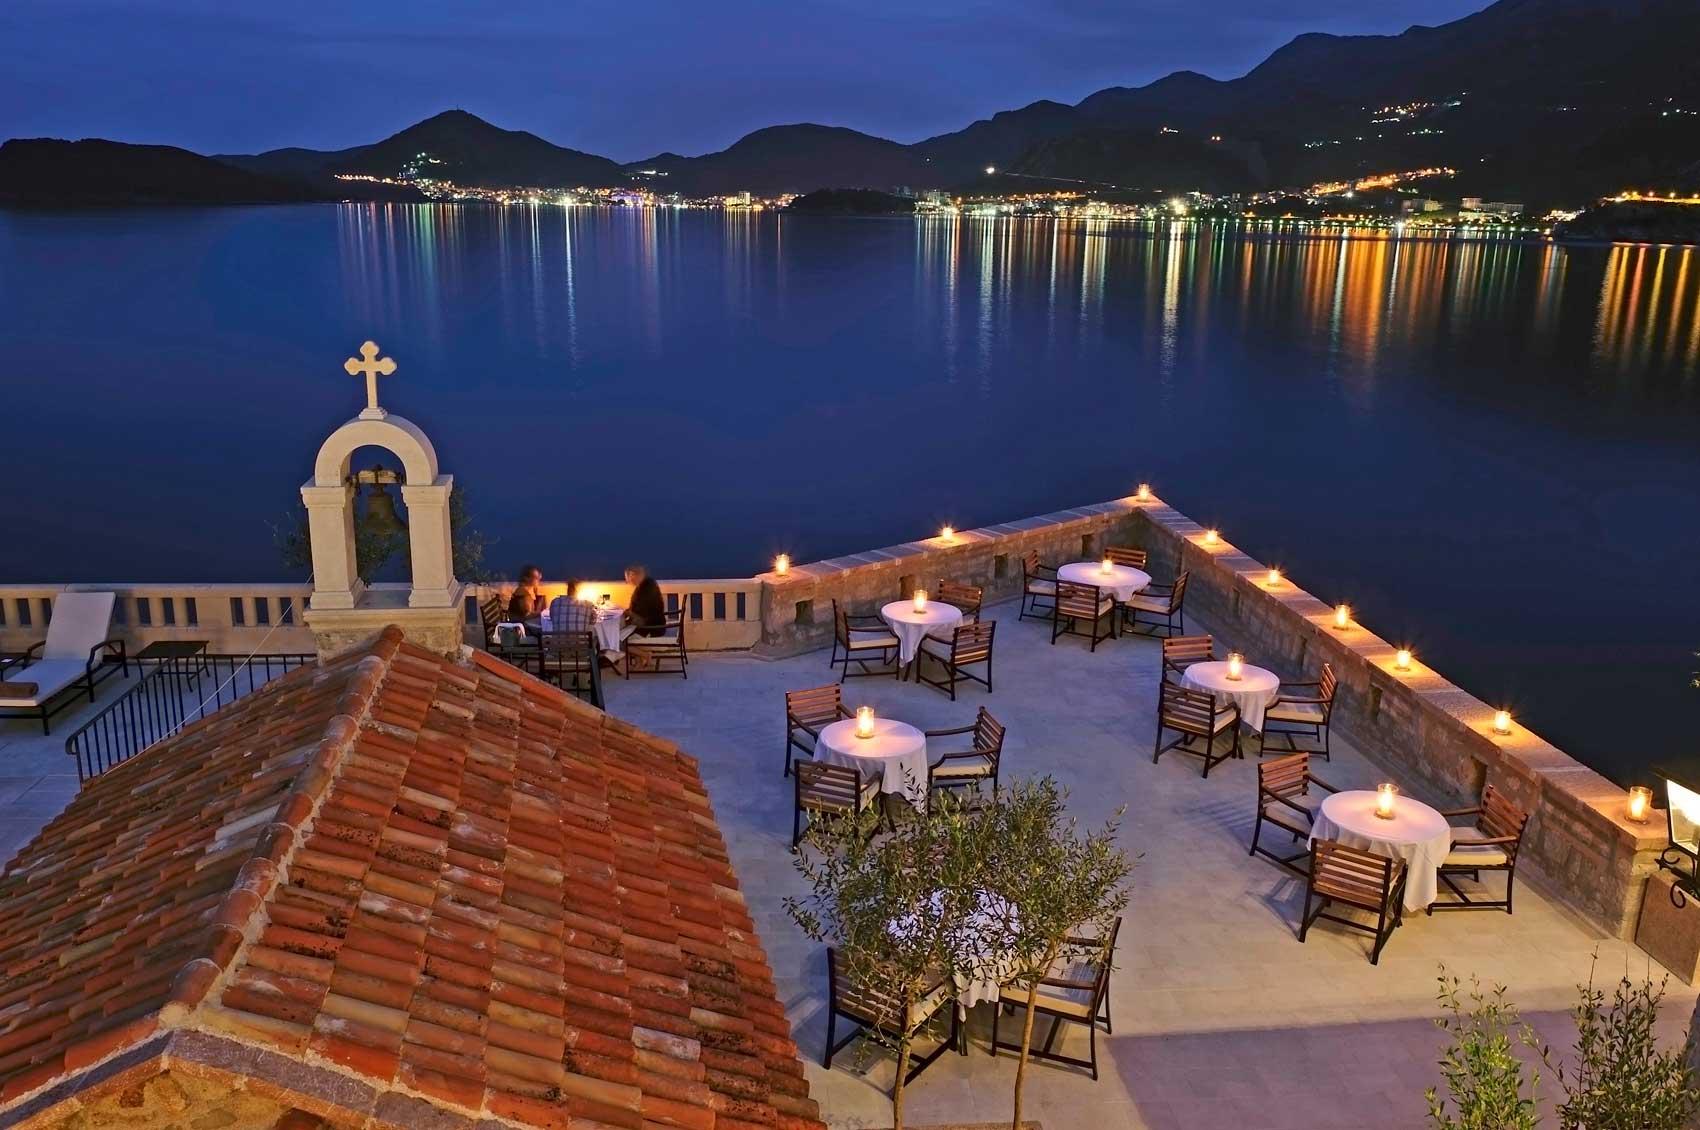 http://www.fodors.com/hotel-awards/2013/images/hotels/aman-sveti-stefan.jpg